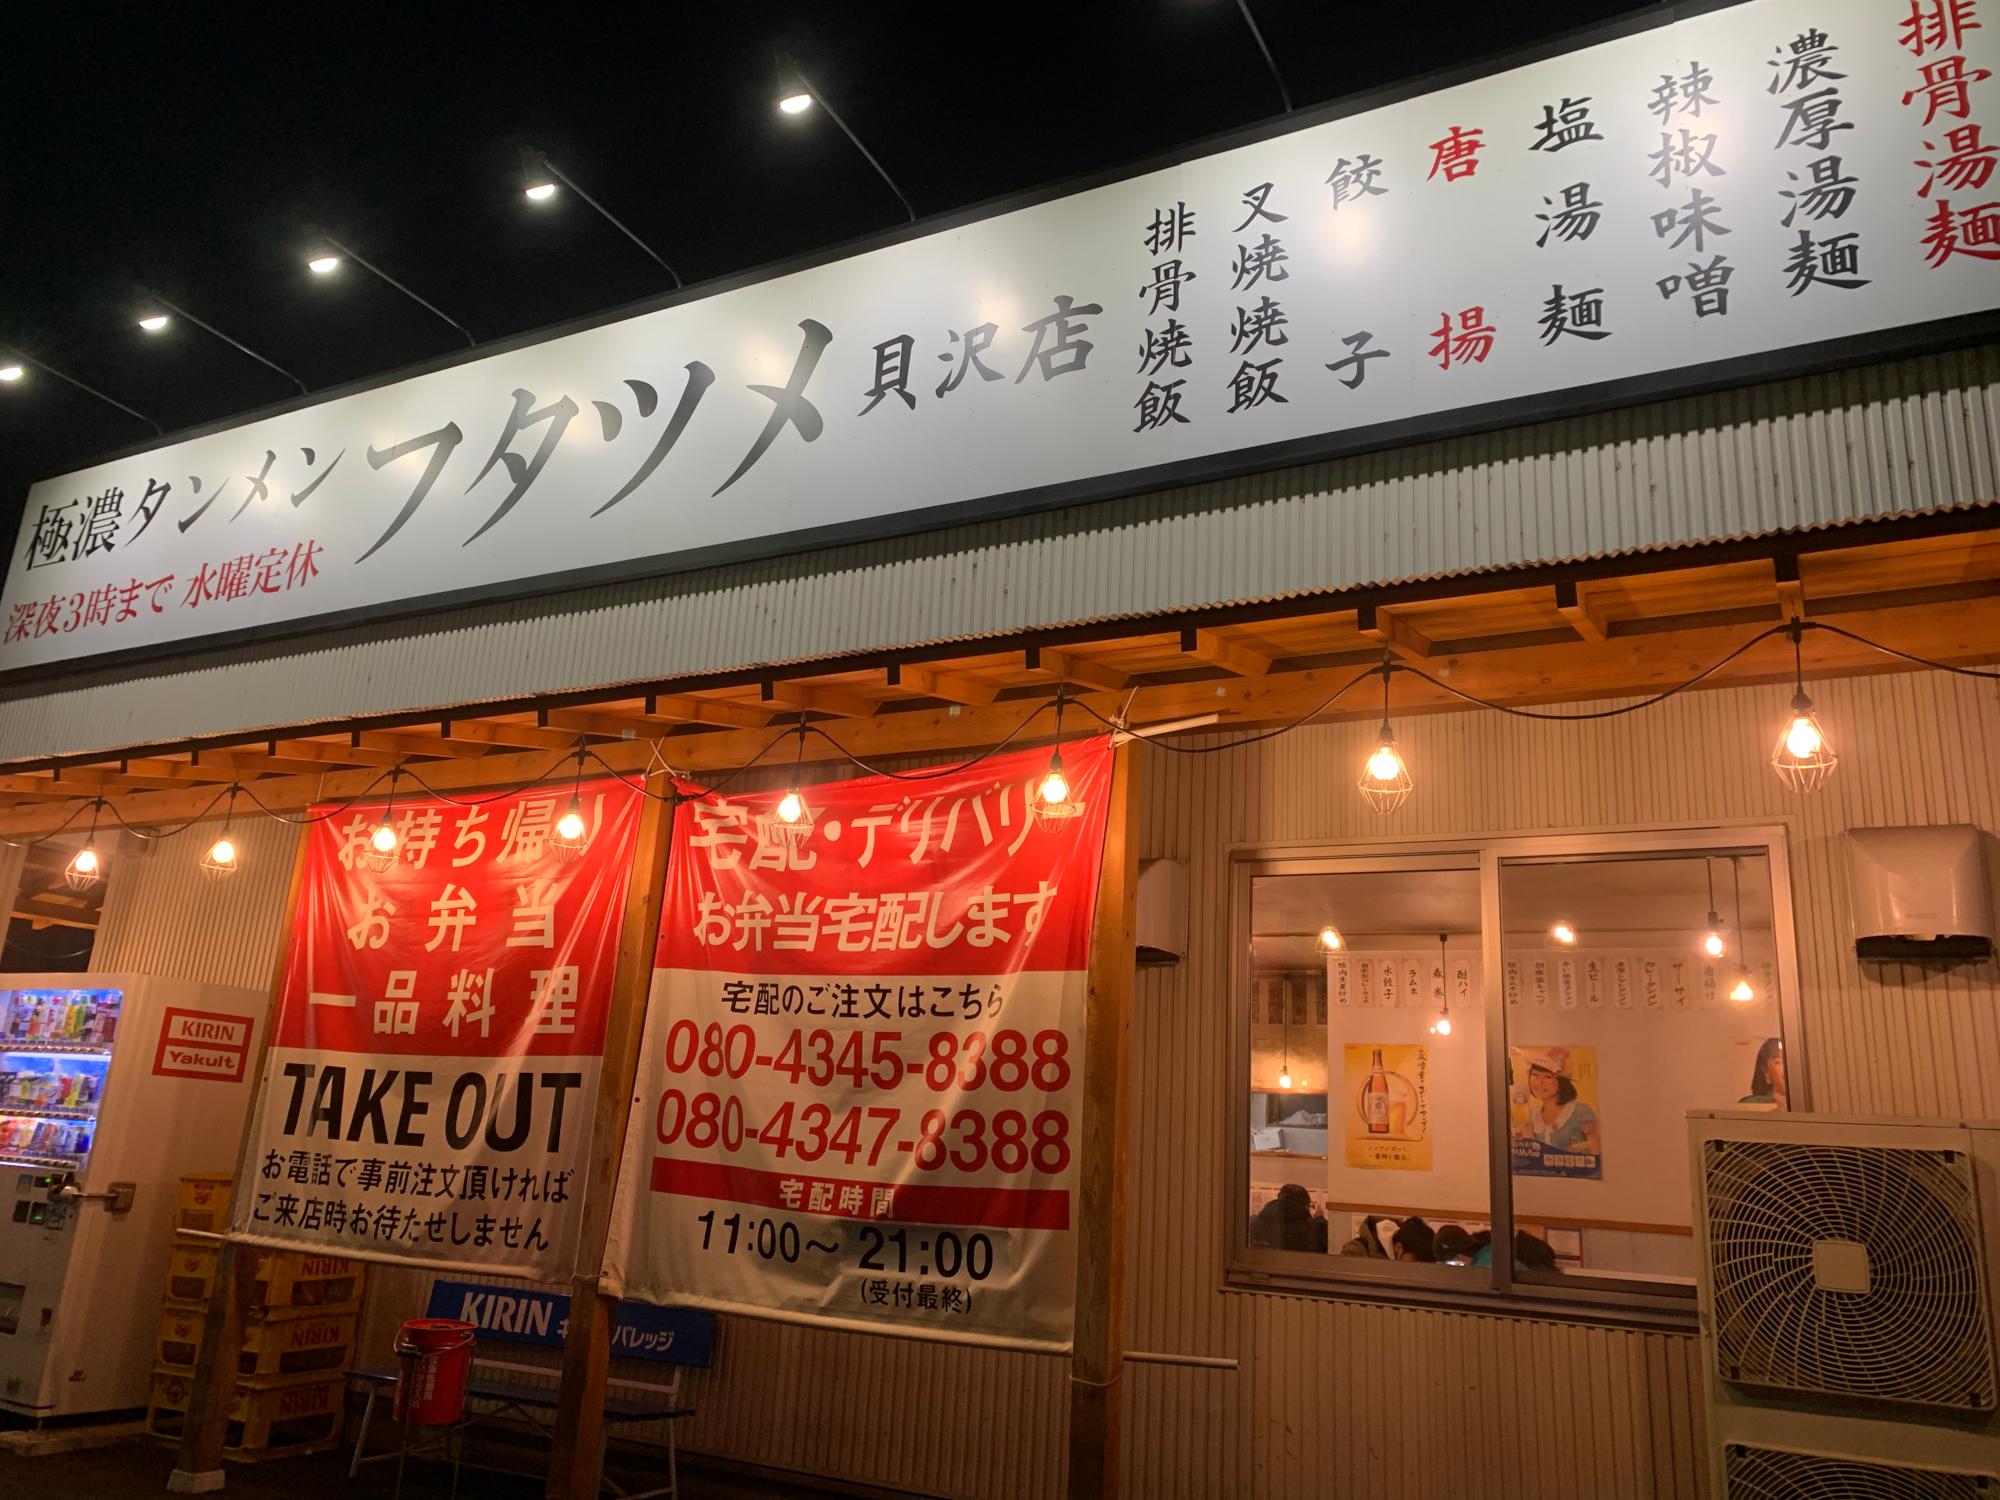 極濃湯麺 フタツメ 貝沢店【貝沢町・令和3年1月21日(木)放送】